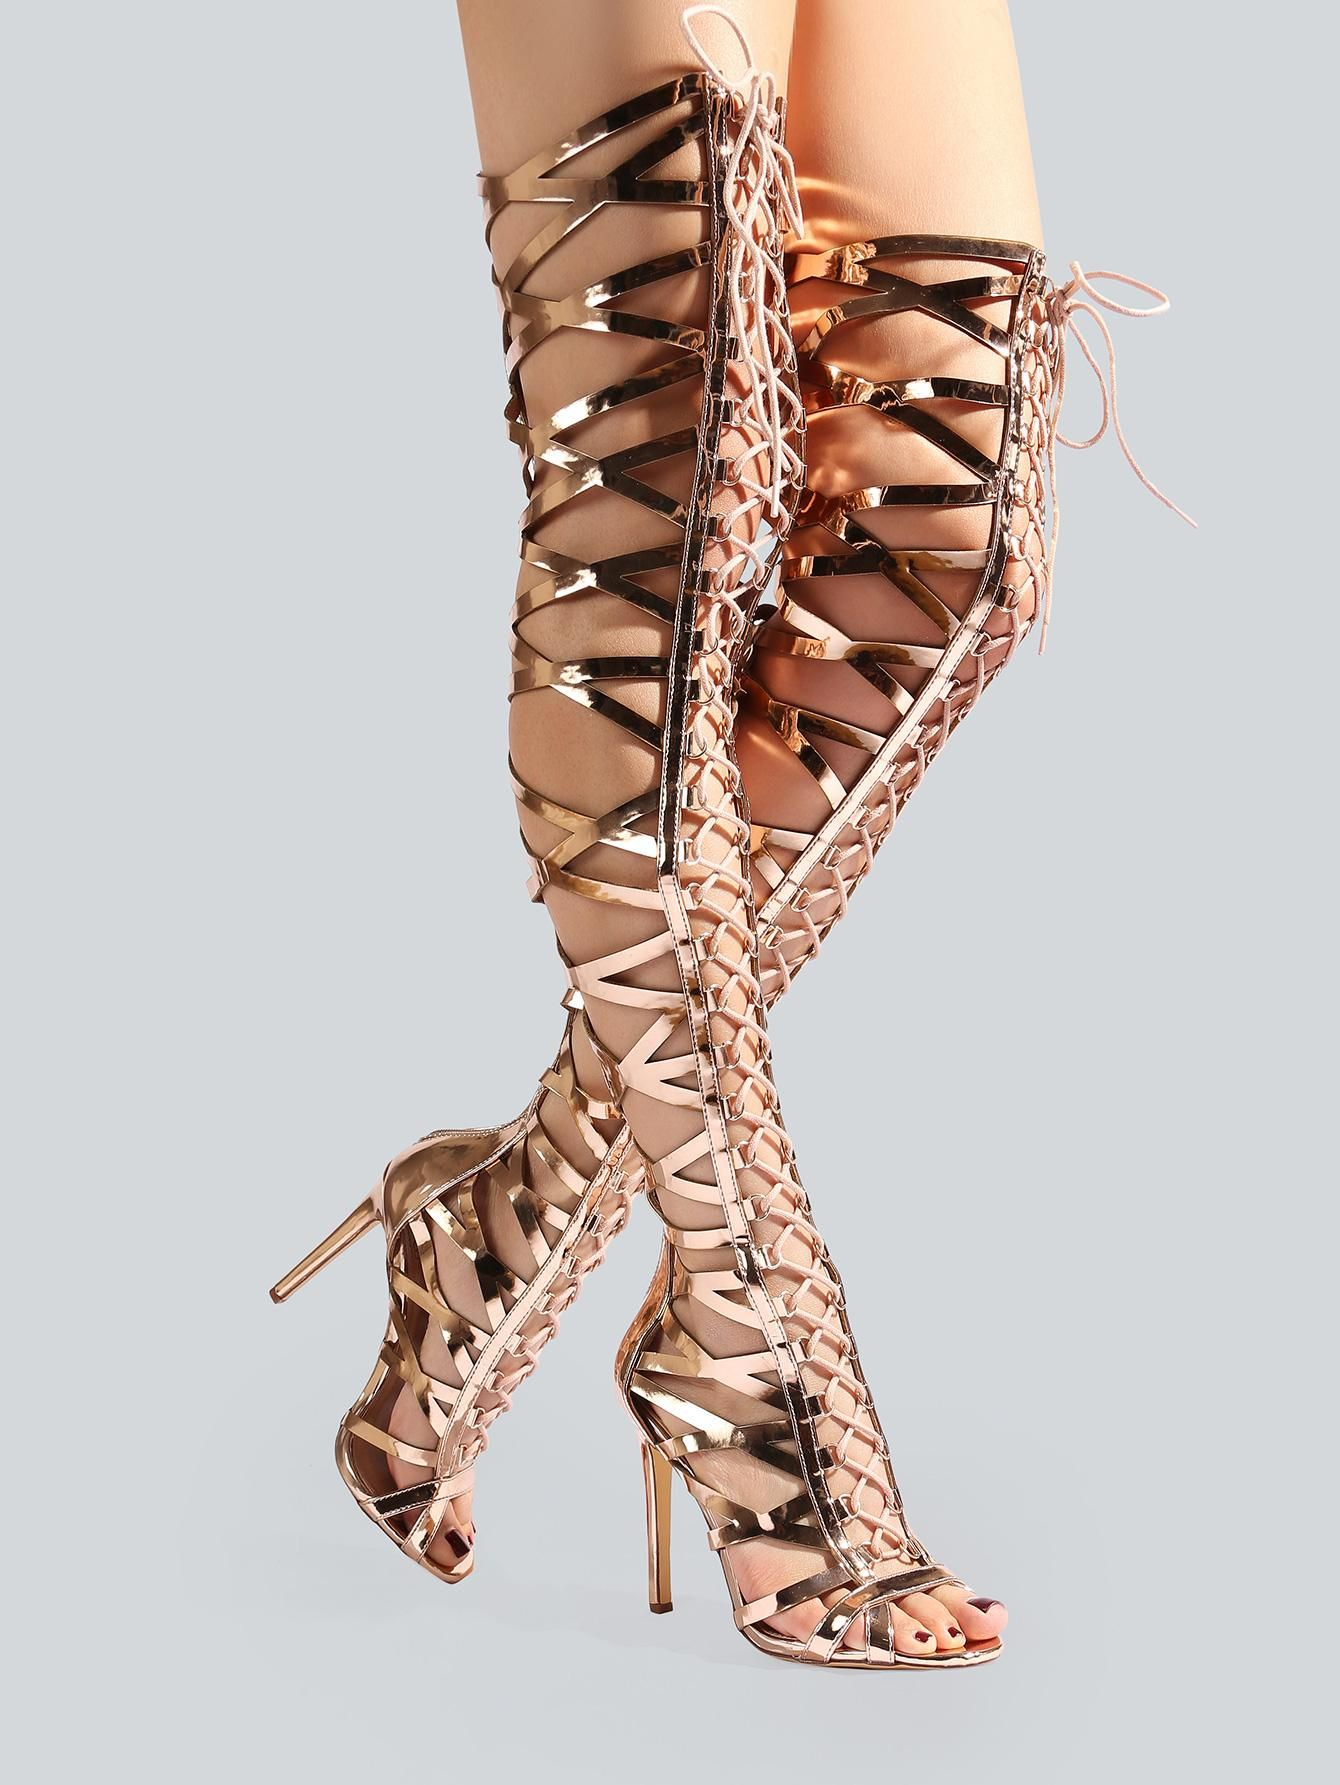 de8ed53f9600 MakeMeChic - MAKEMECHIC Metallic Caged Thigh High Heels ROSE GOLD -  AdoreWe.com